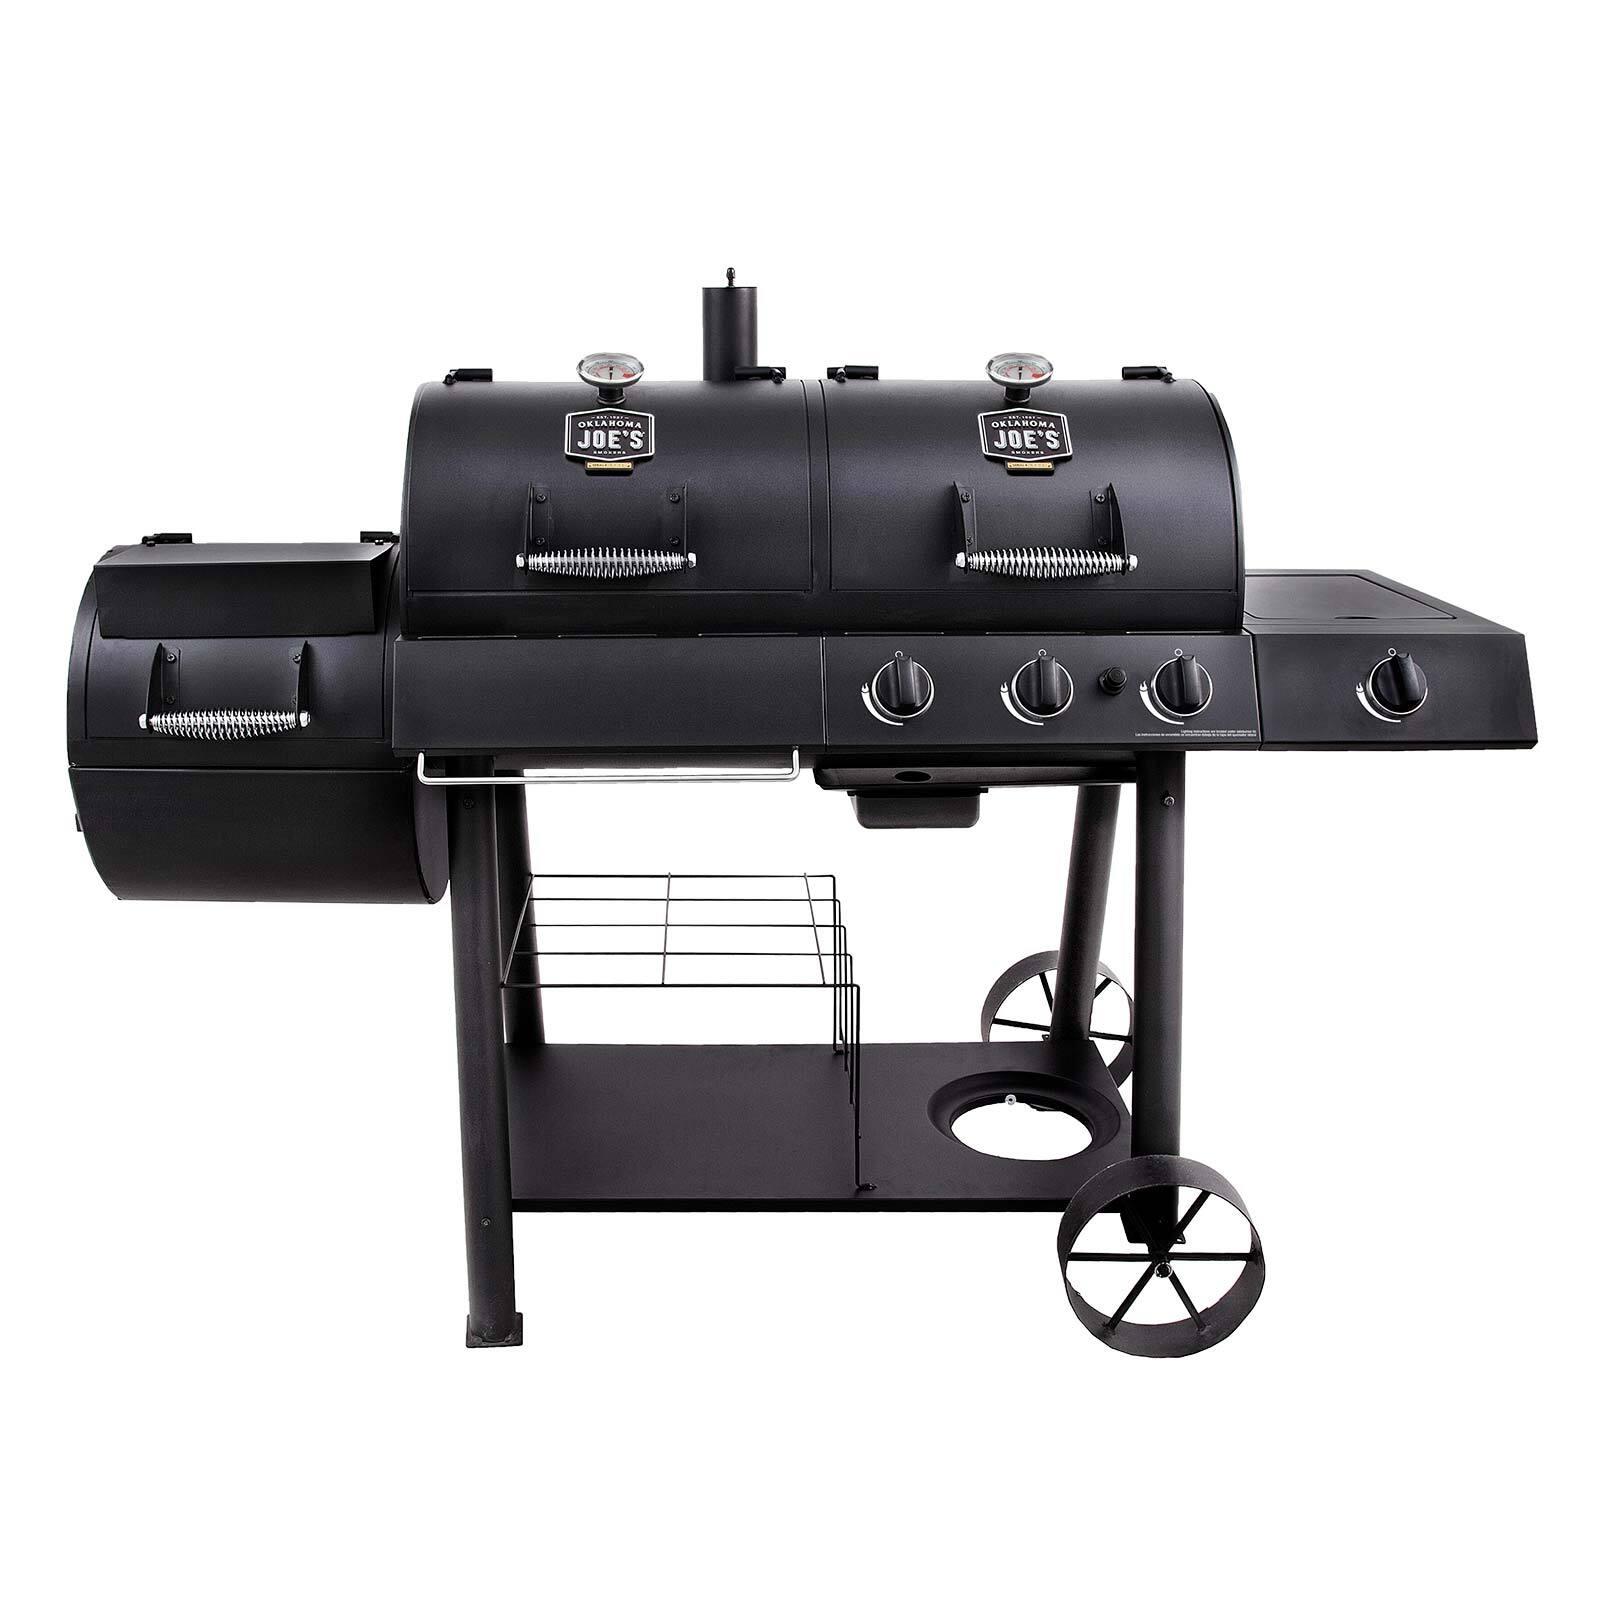 Oklahoma Joe's 'Longhorn Combo' Charcoal/Gas Smoker & Grill